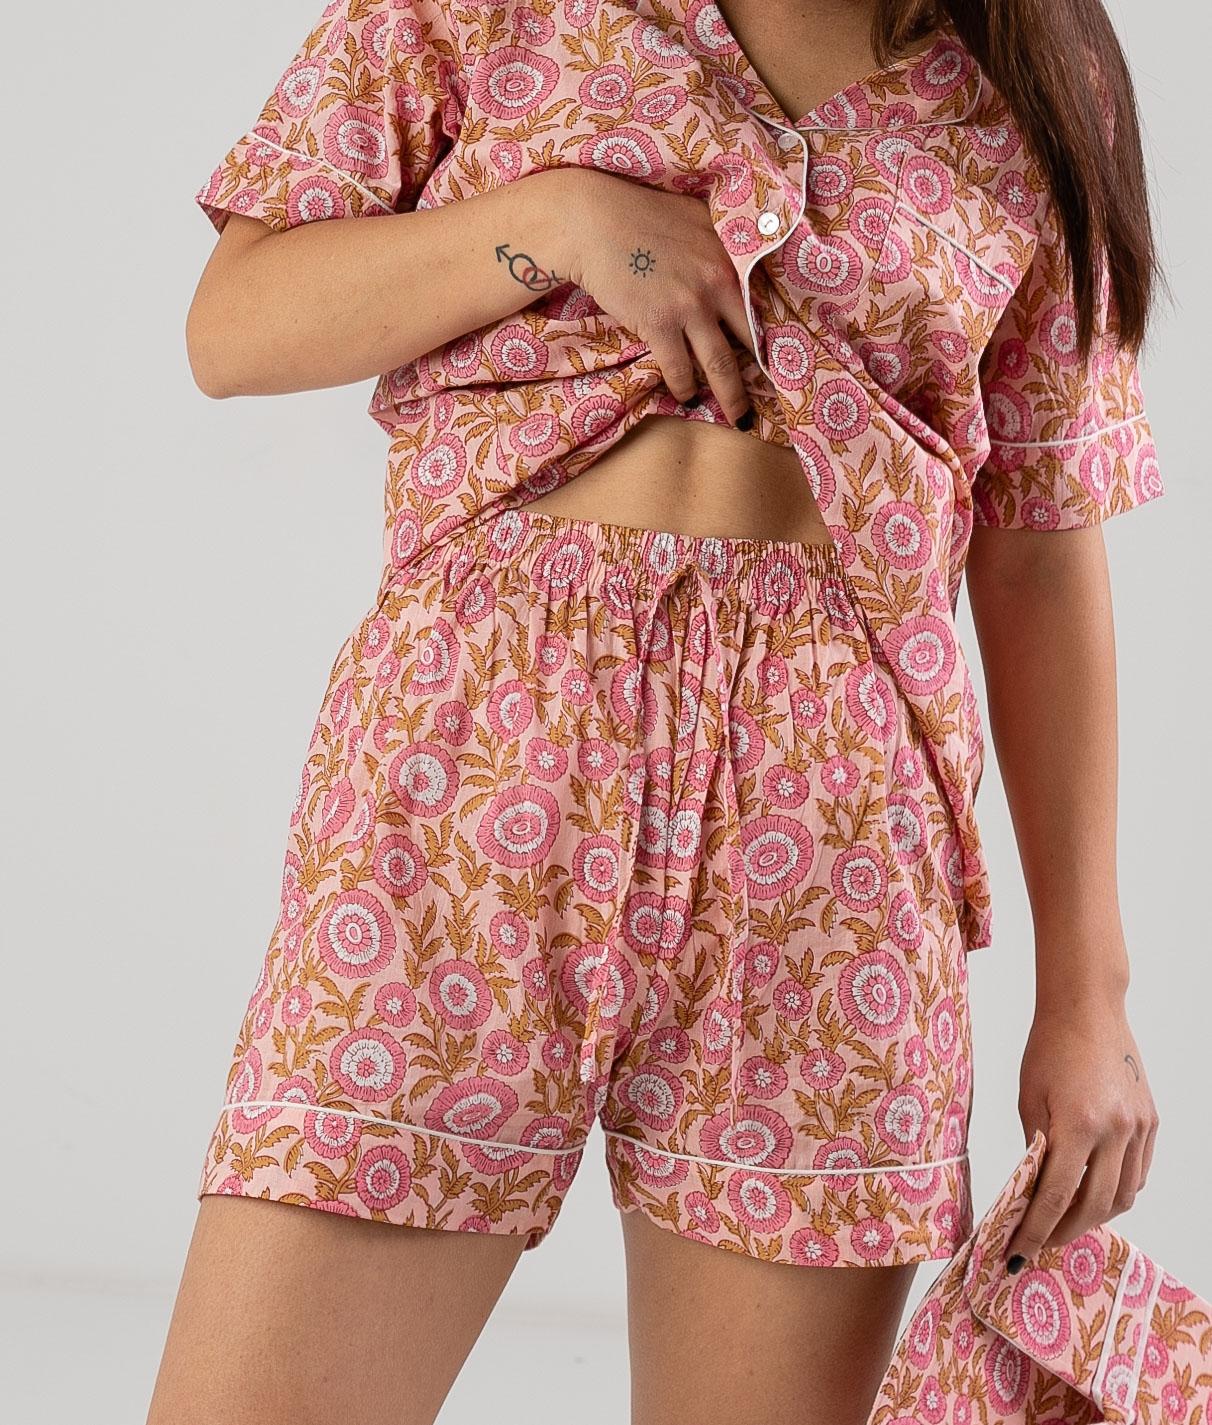 Pijama Ritrea - Pink